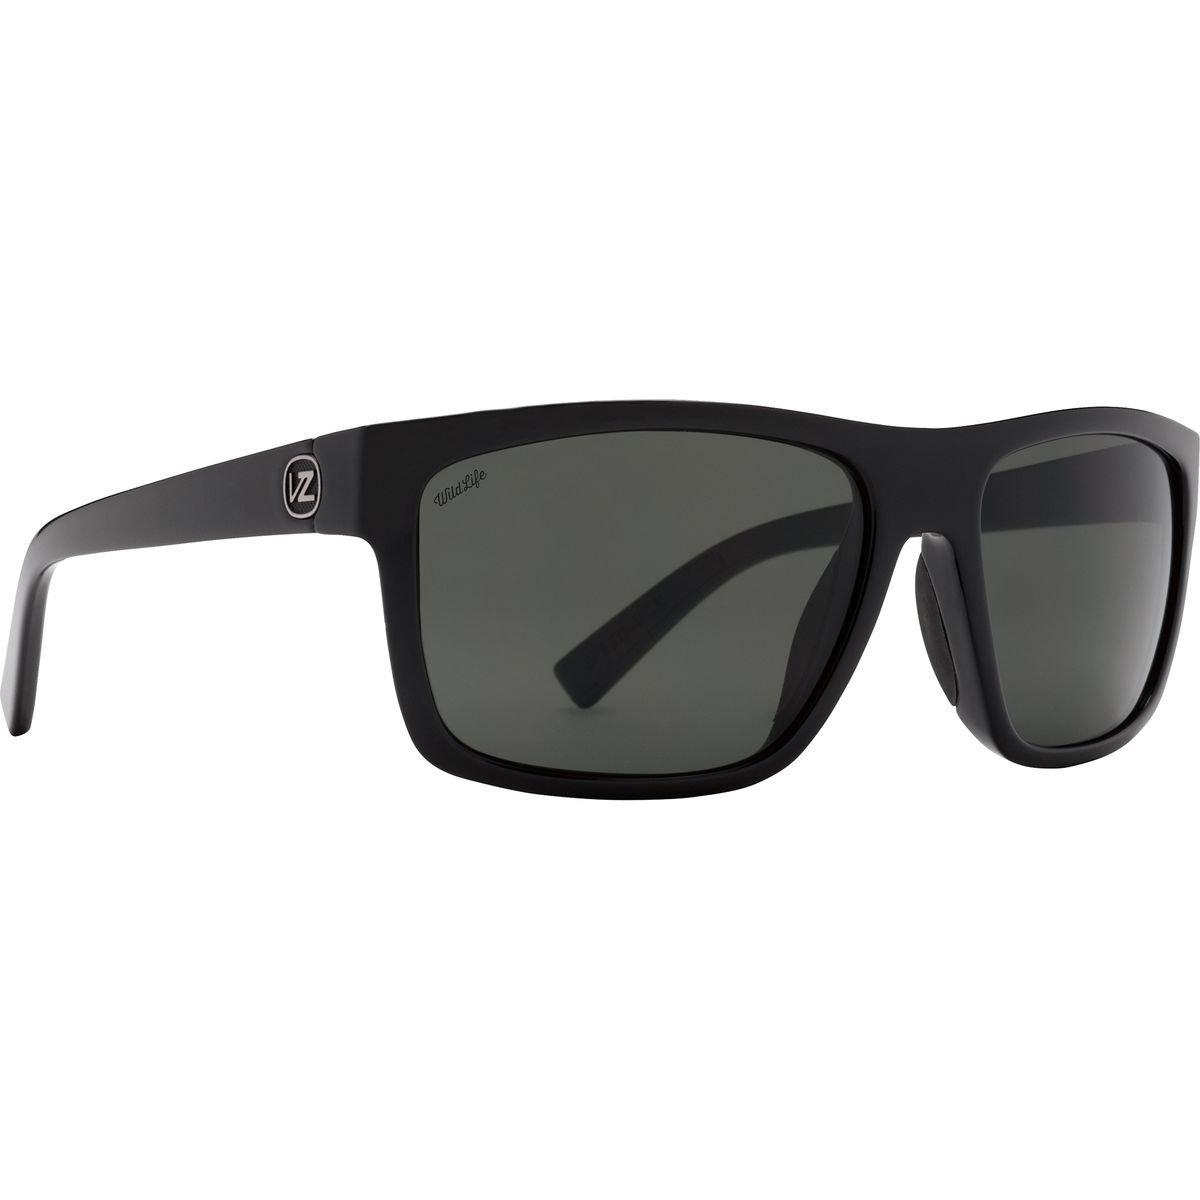 577bb9bf93853 Amazon.com  VonZipper Mens Speedtuck Polarized Sunglasses